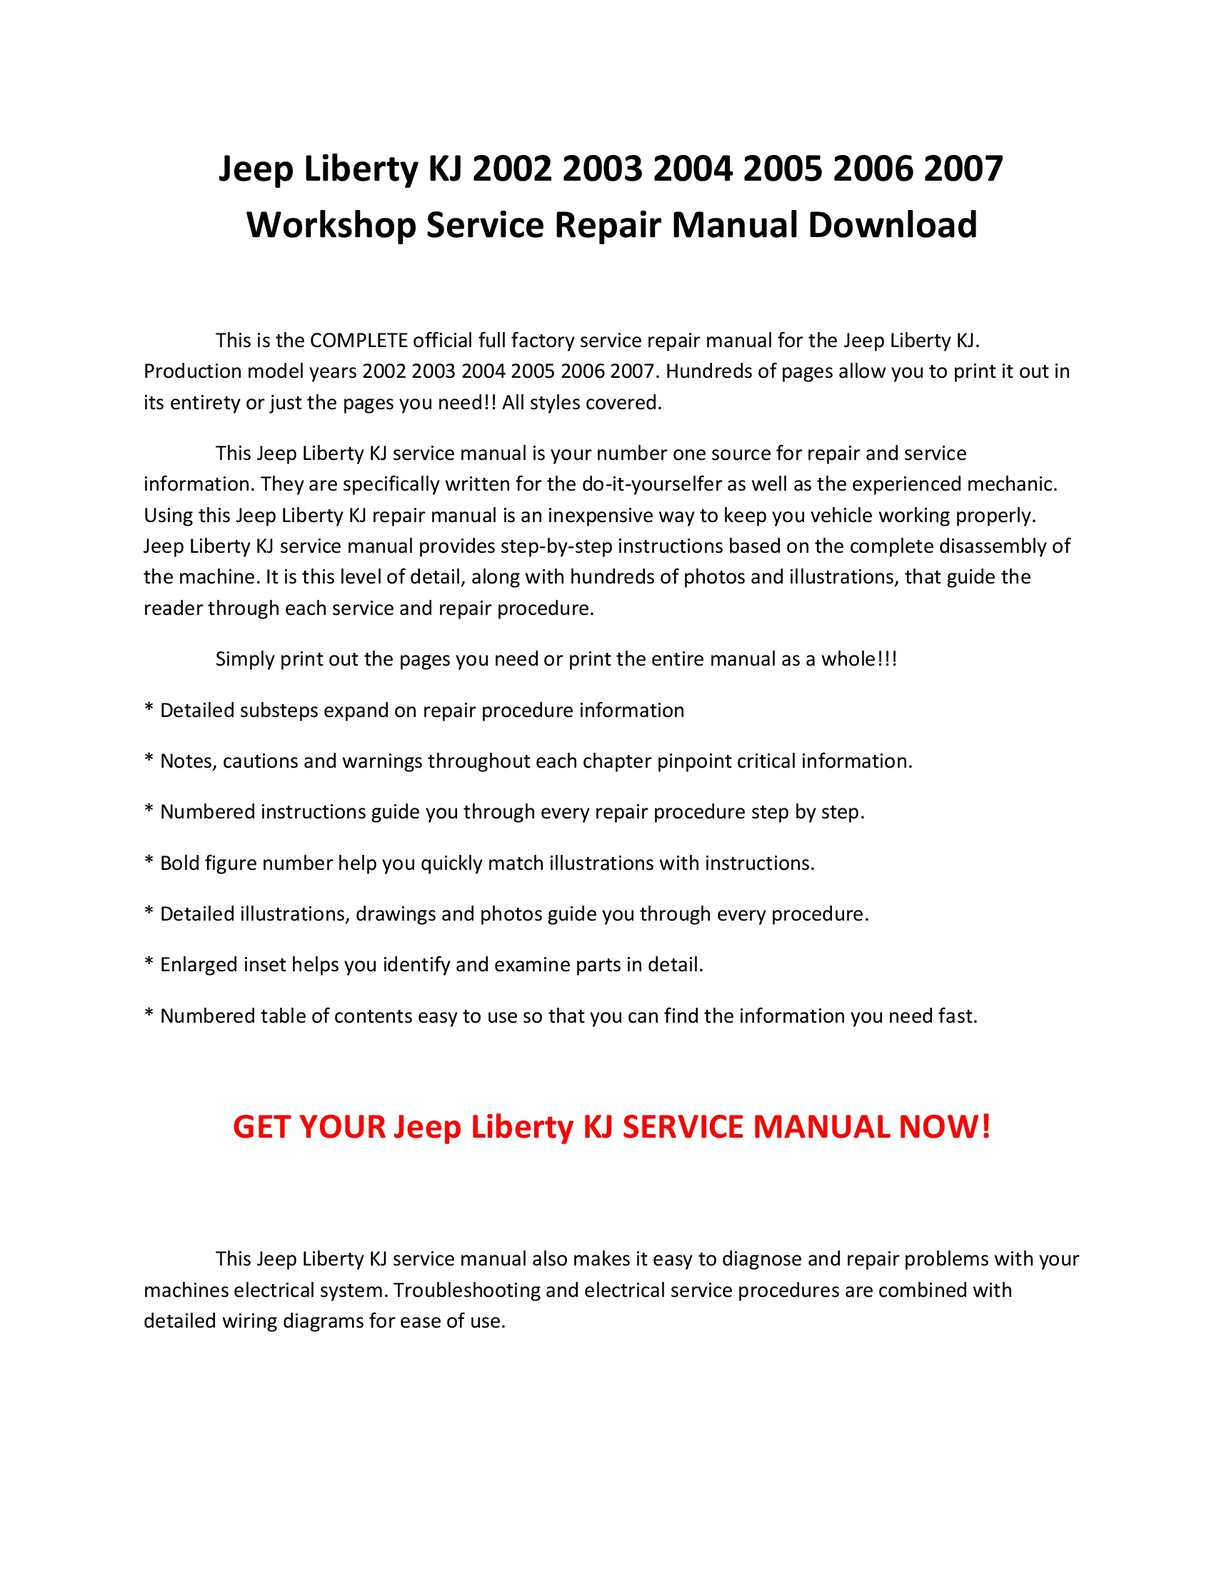 jeep liberty kj 2002 2007 service repair manual autos post. Black Bedroom Furniture Sets. Home Design Ideas